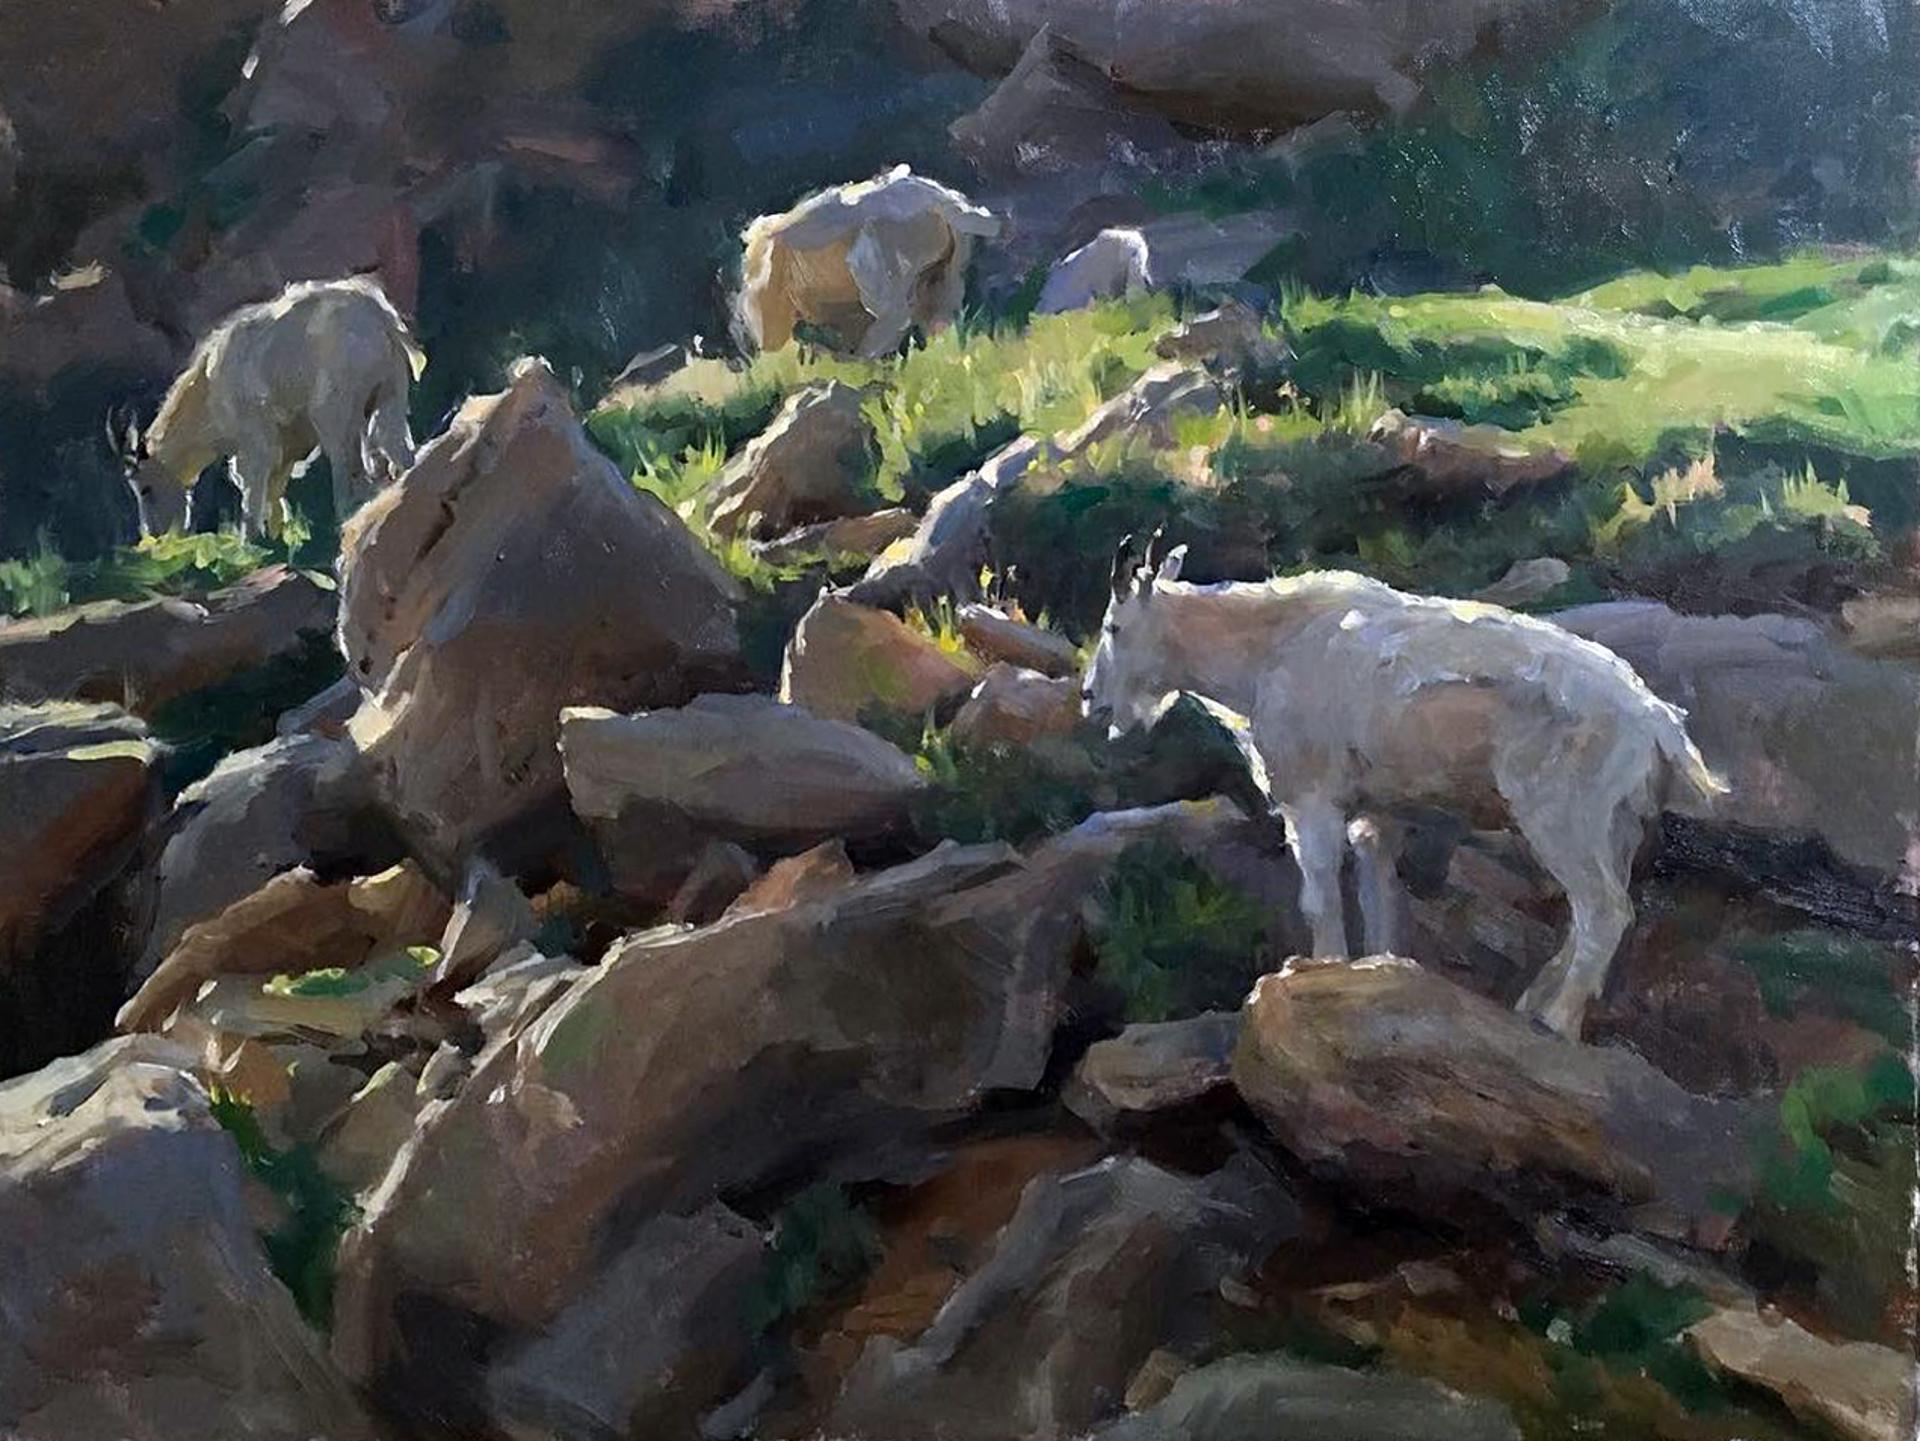 Mountain Goats by Kyle Ma